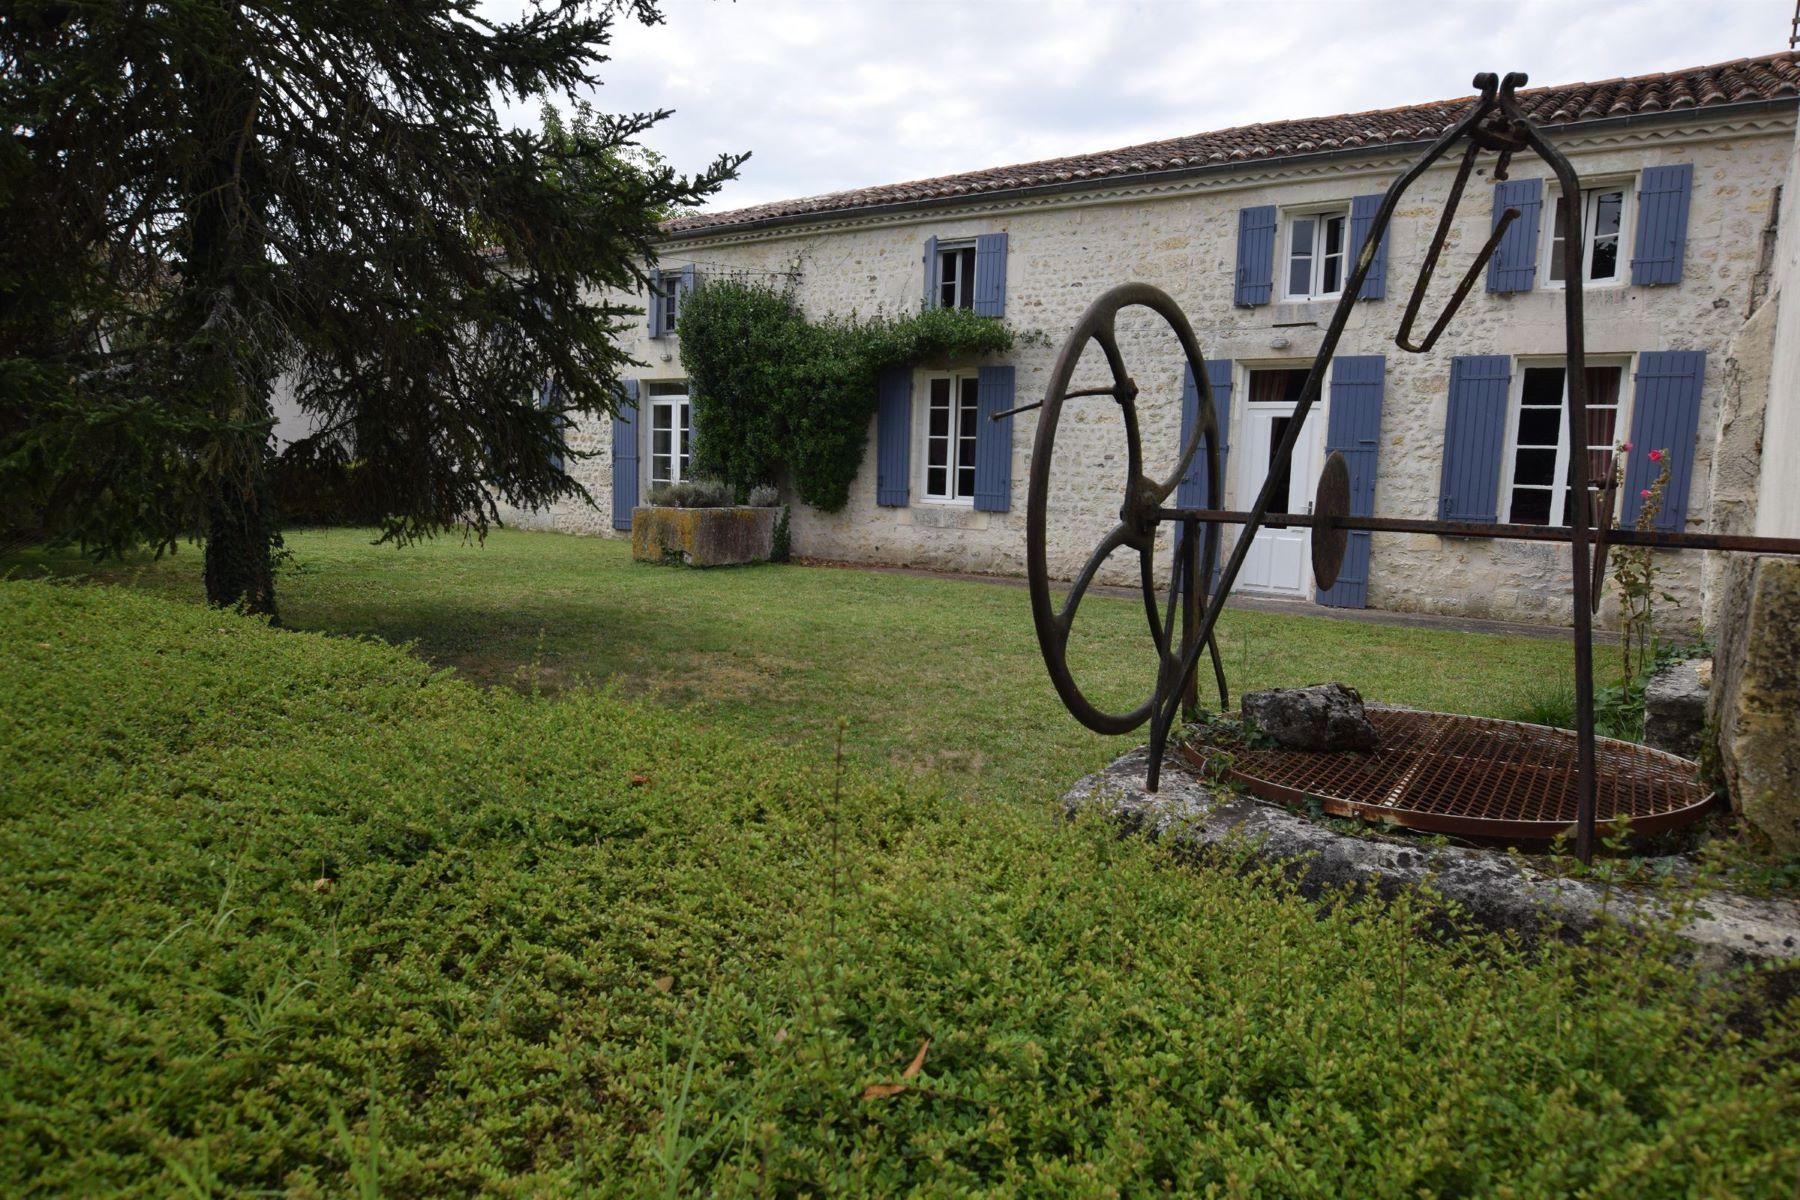 Casa Unifamiliar por un Venta en Stone Charentaise house with swimming pool Cozes, Poitou-Charentes, 17120 Francia